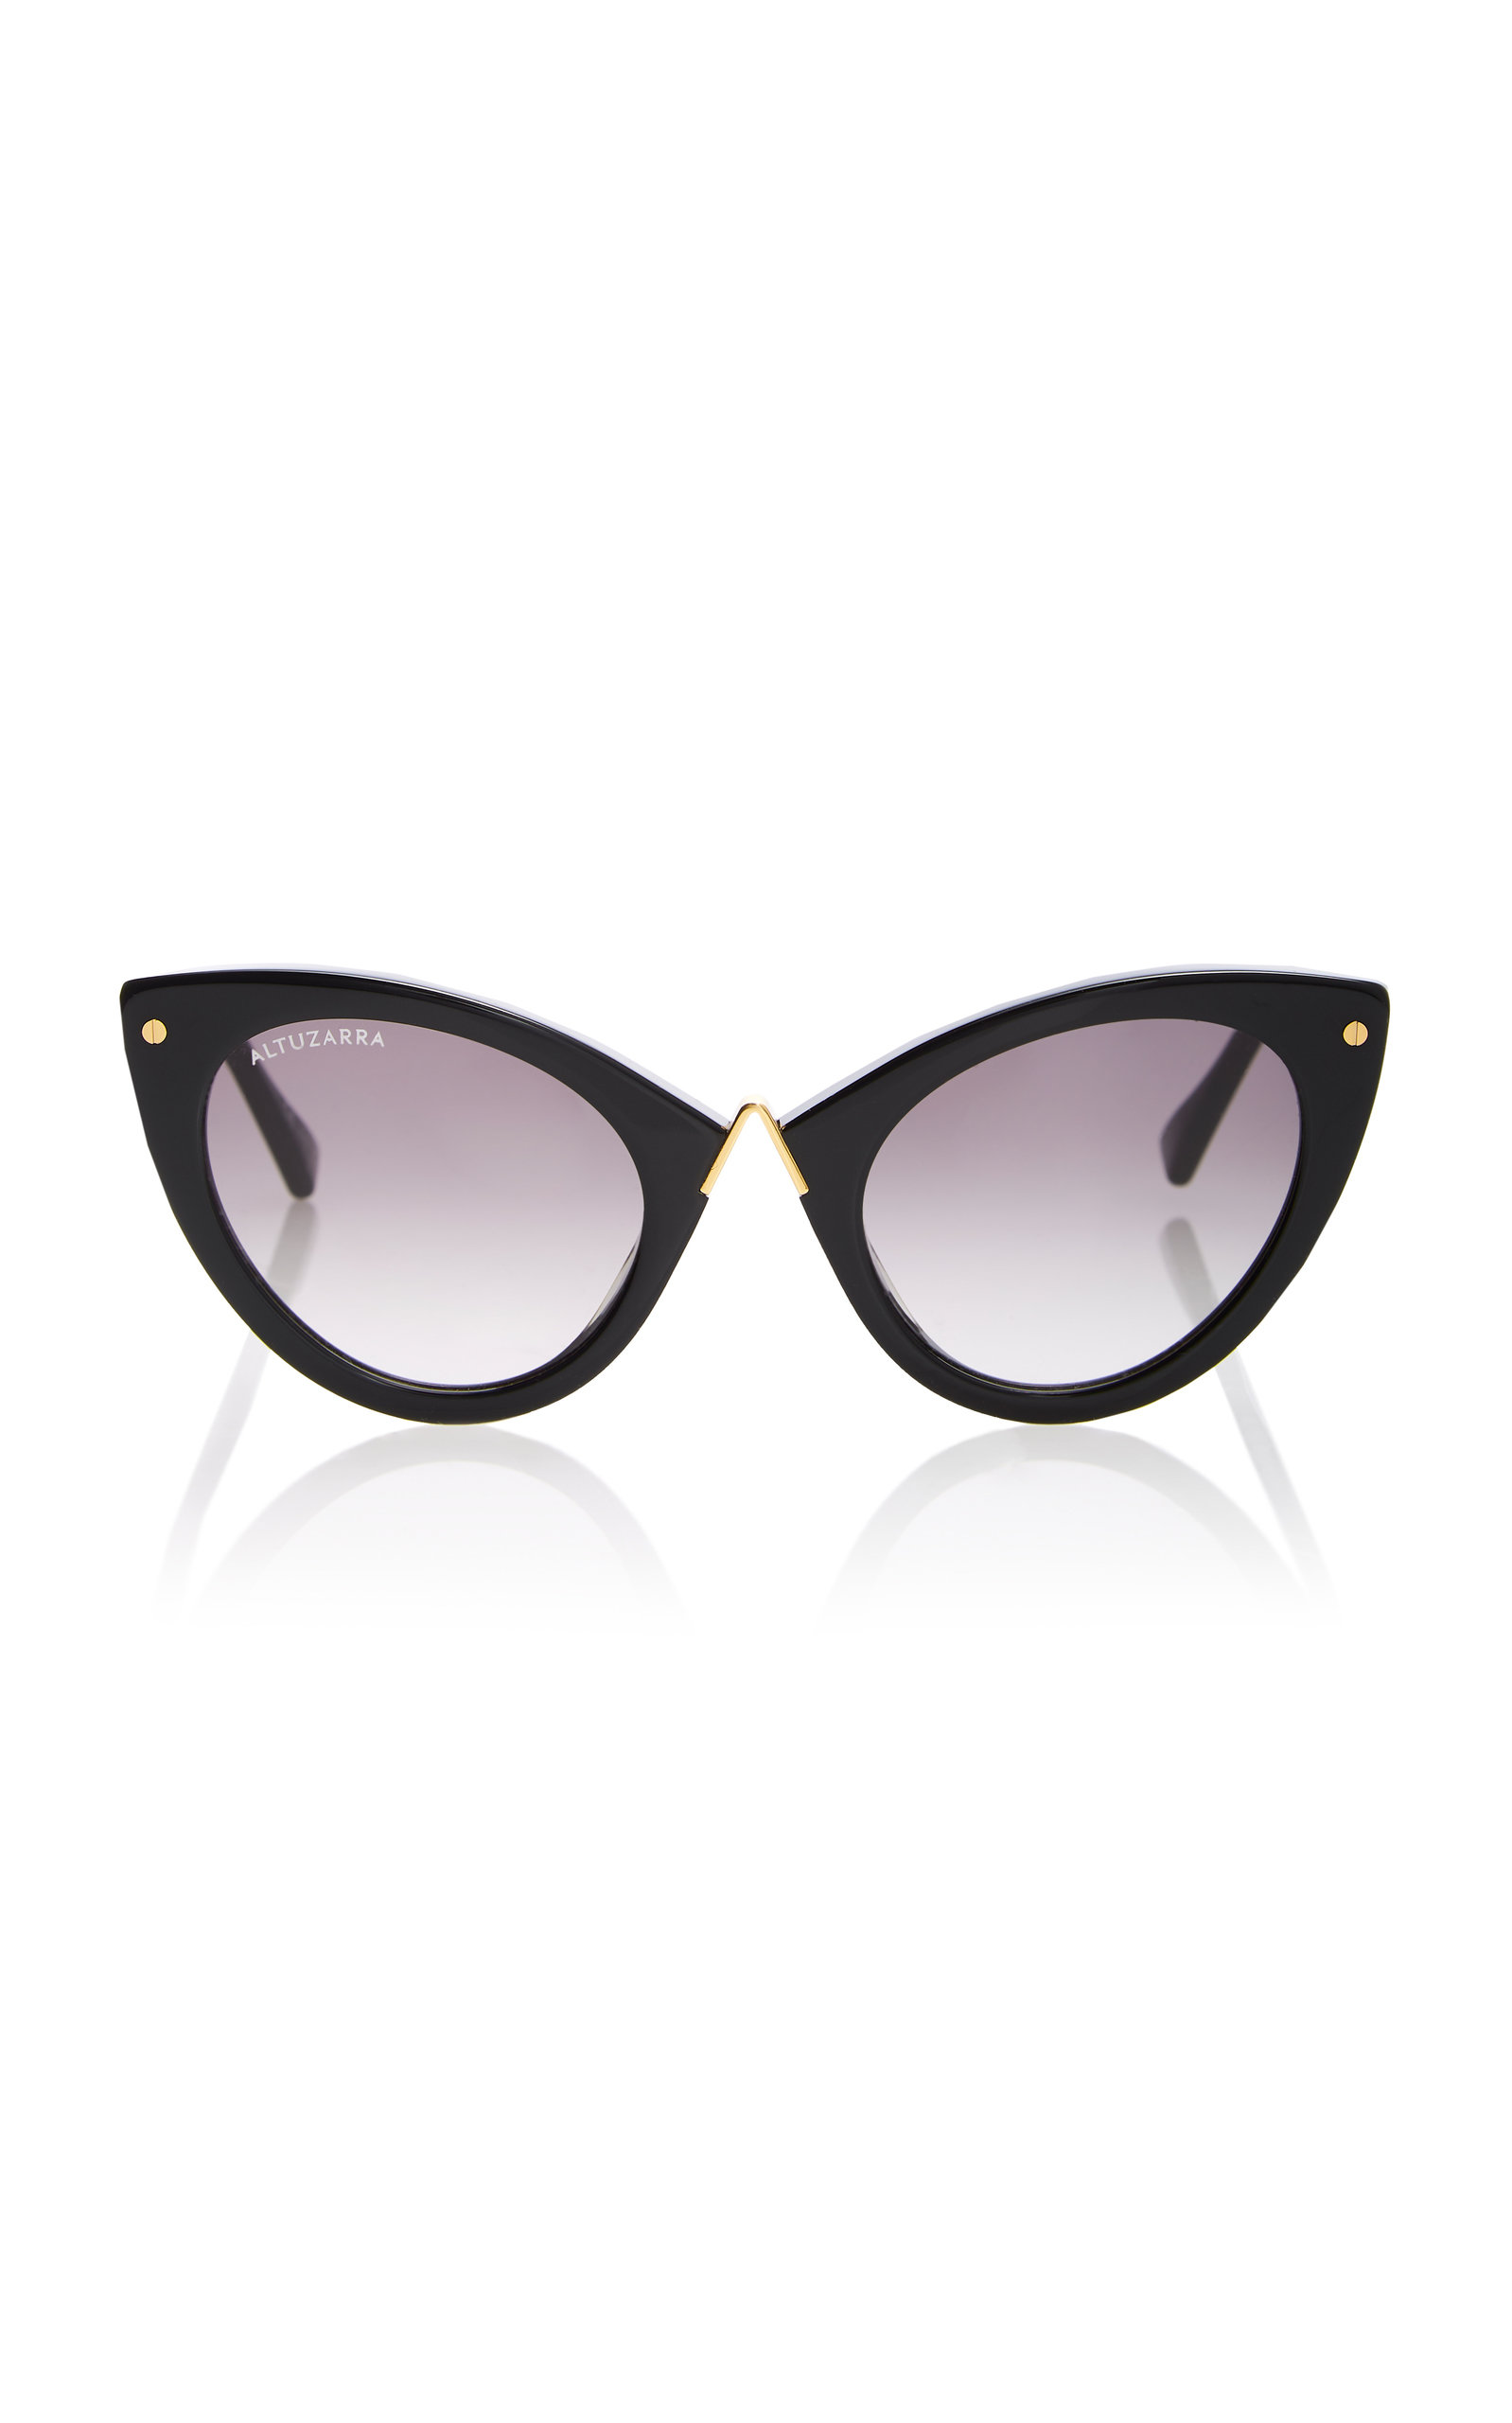 ALTUZARRA SUNGLASSES Acetate Cat-Eye Sunglasses in Black